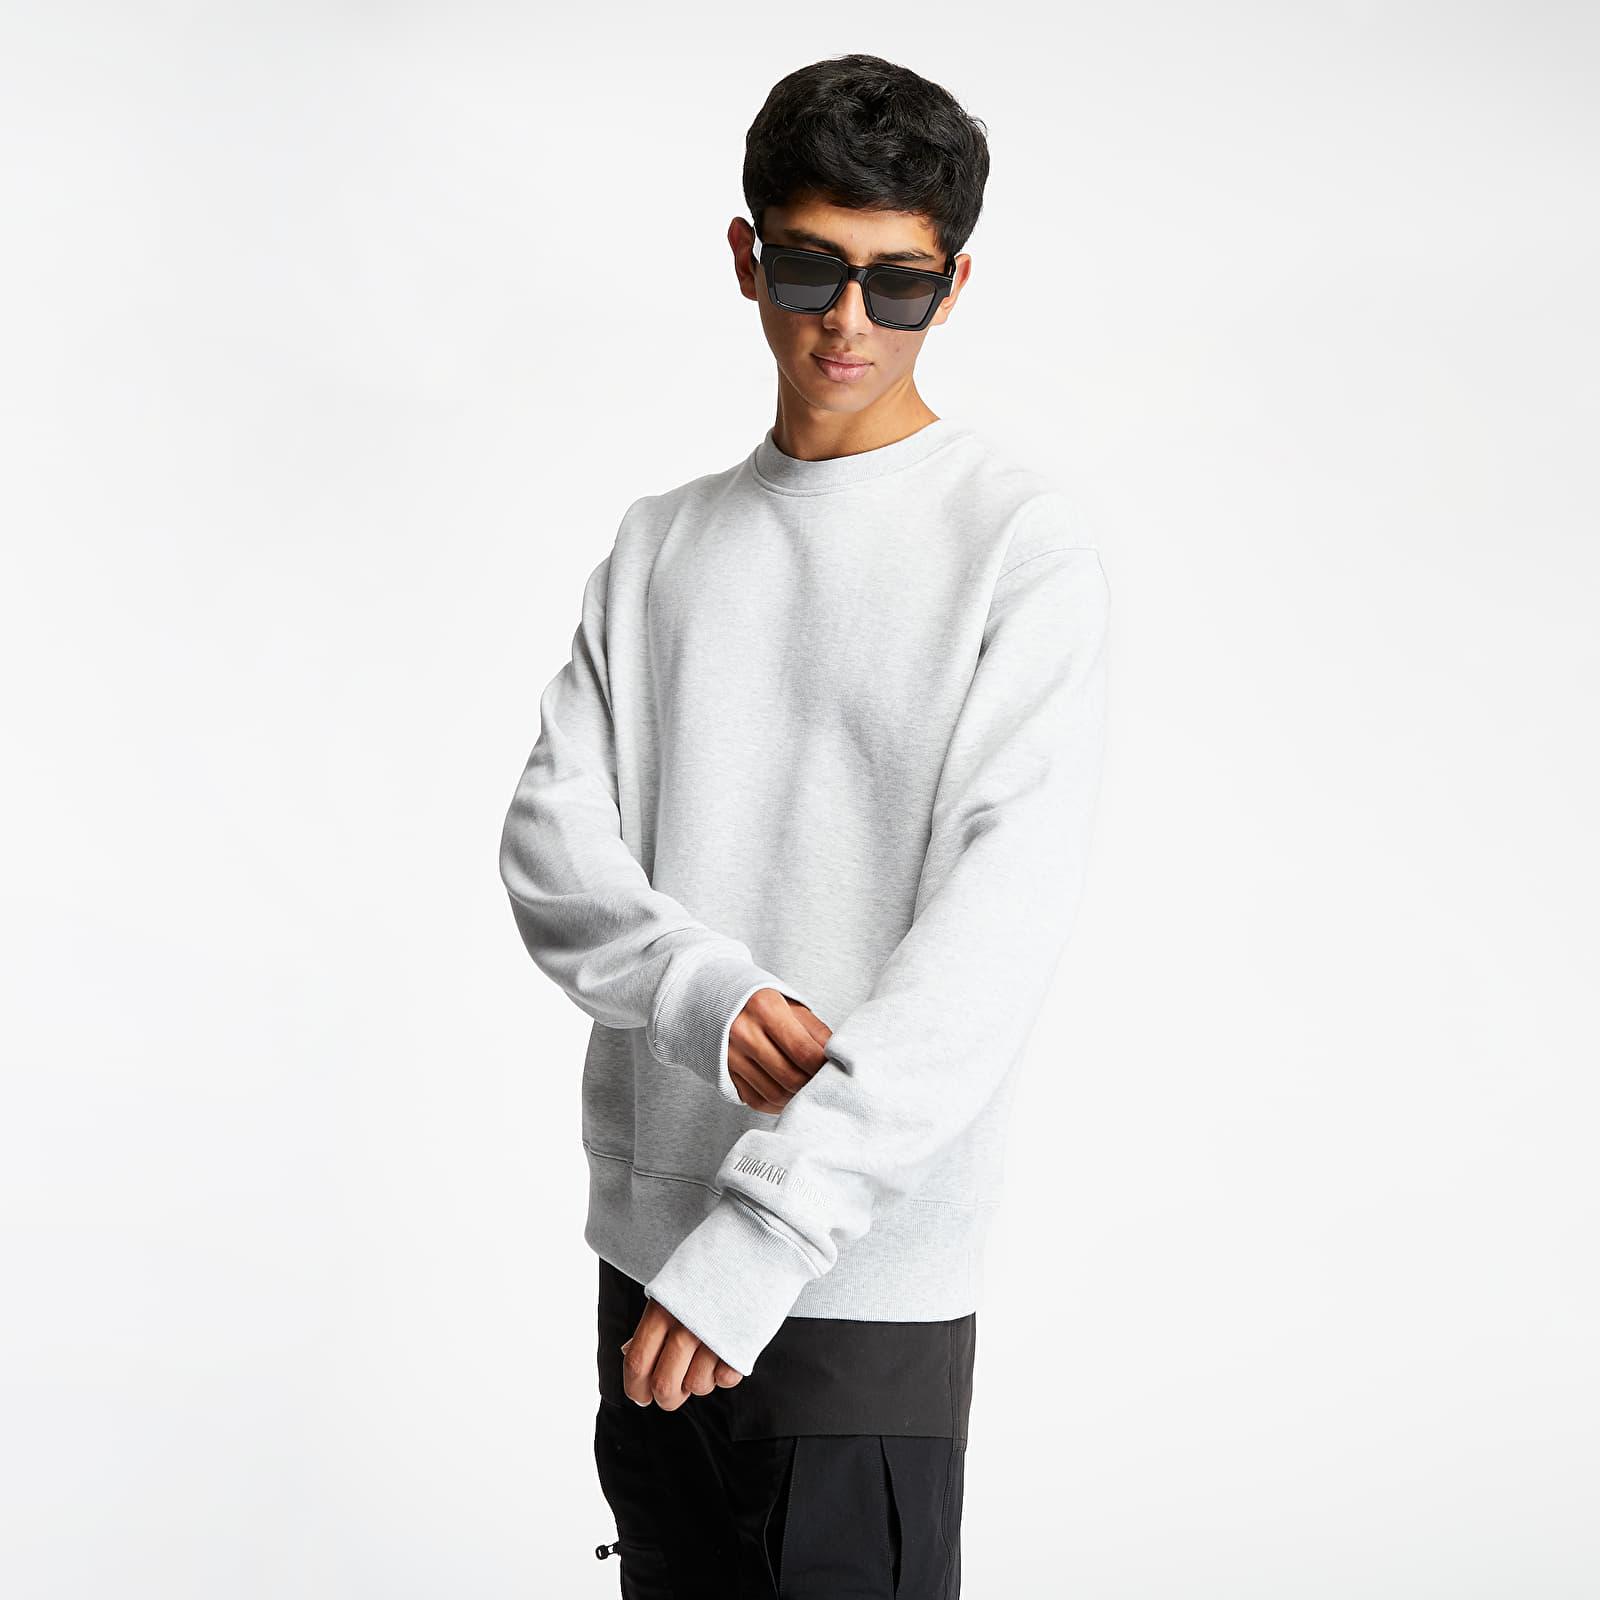 Sweatshirts adidas x Pharrell Williams Basics Crewneck Light Grey Heather